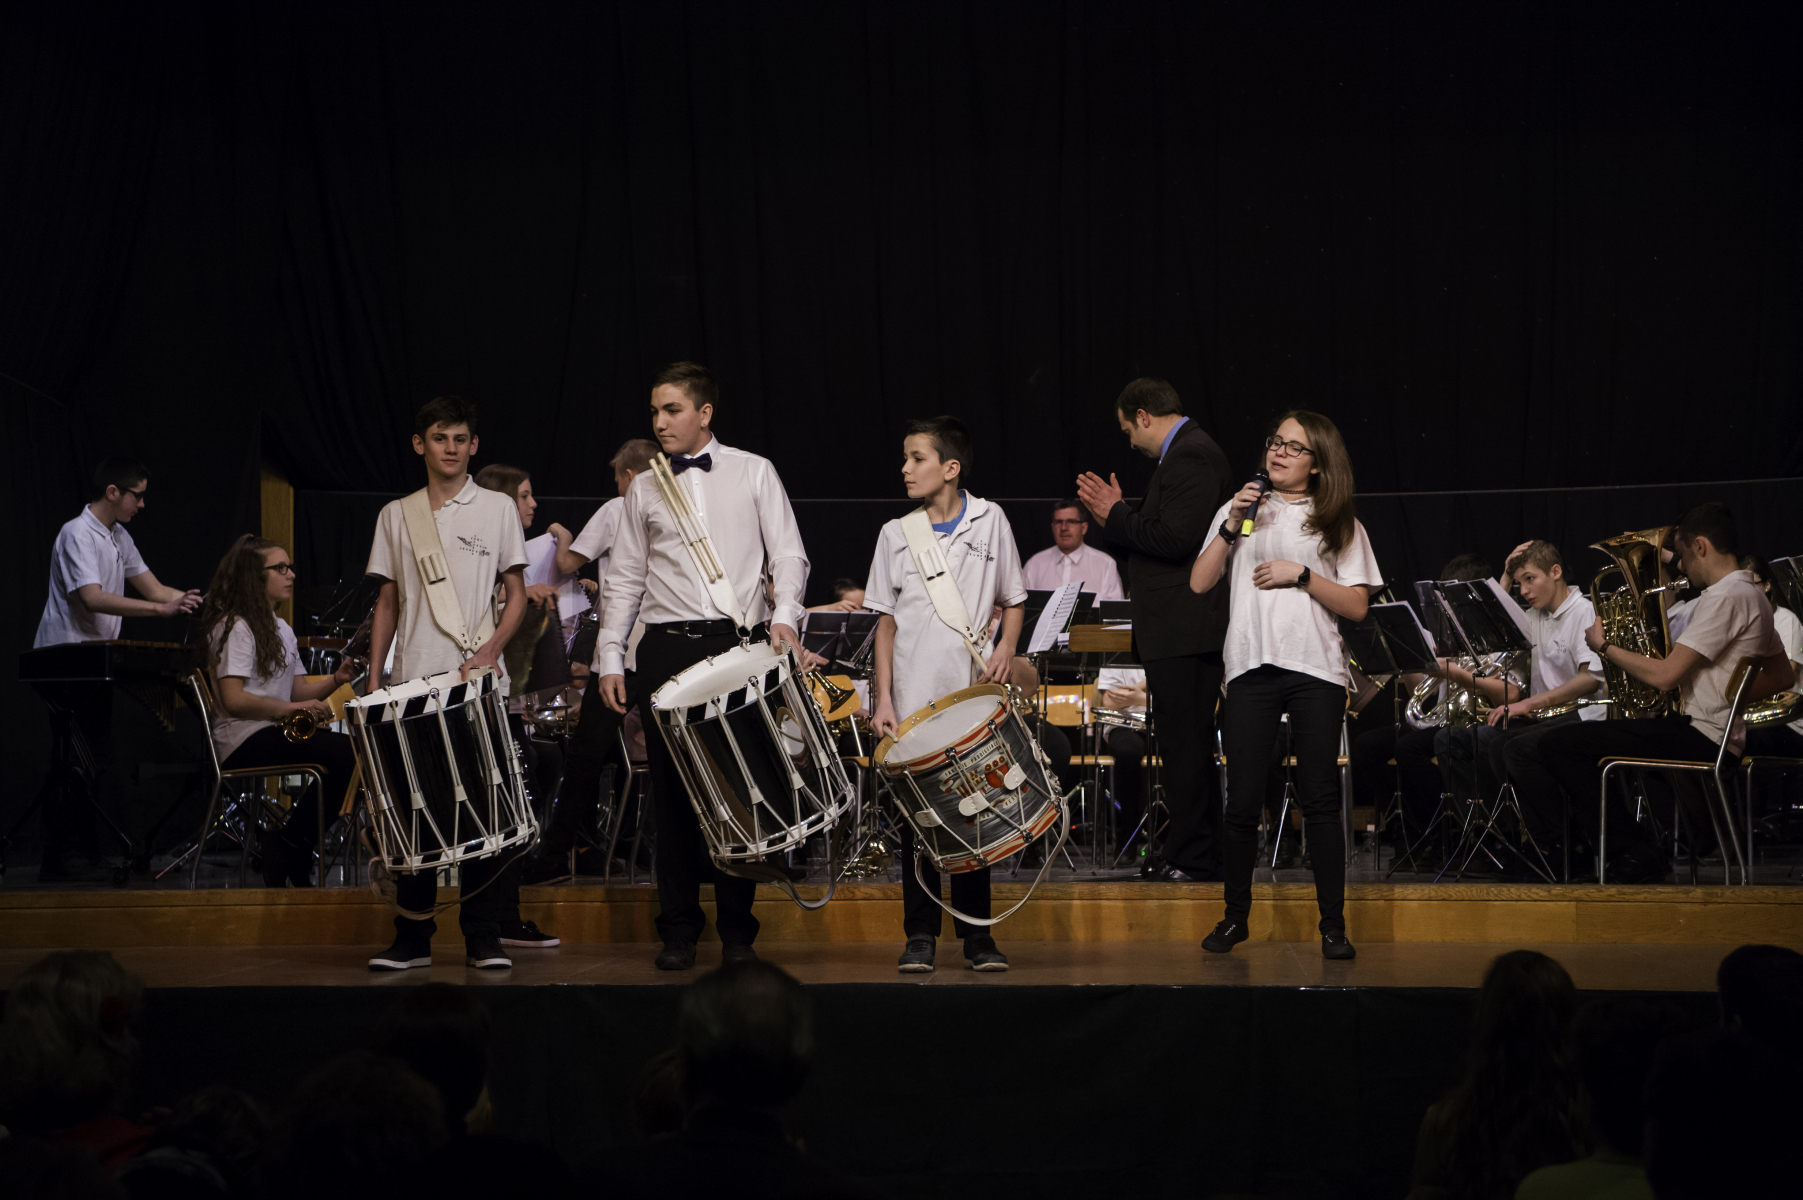 170211_concert_annuel17-020